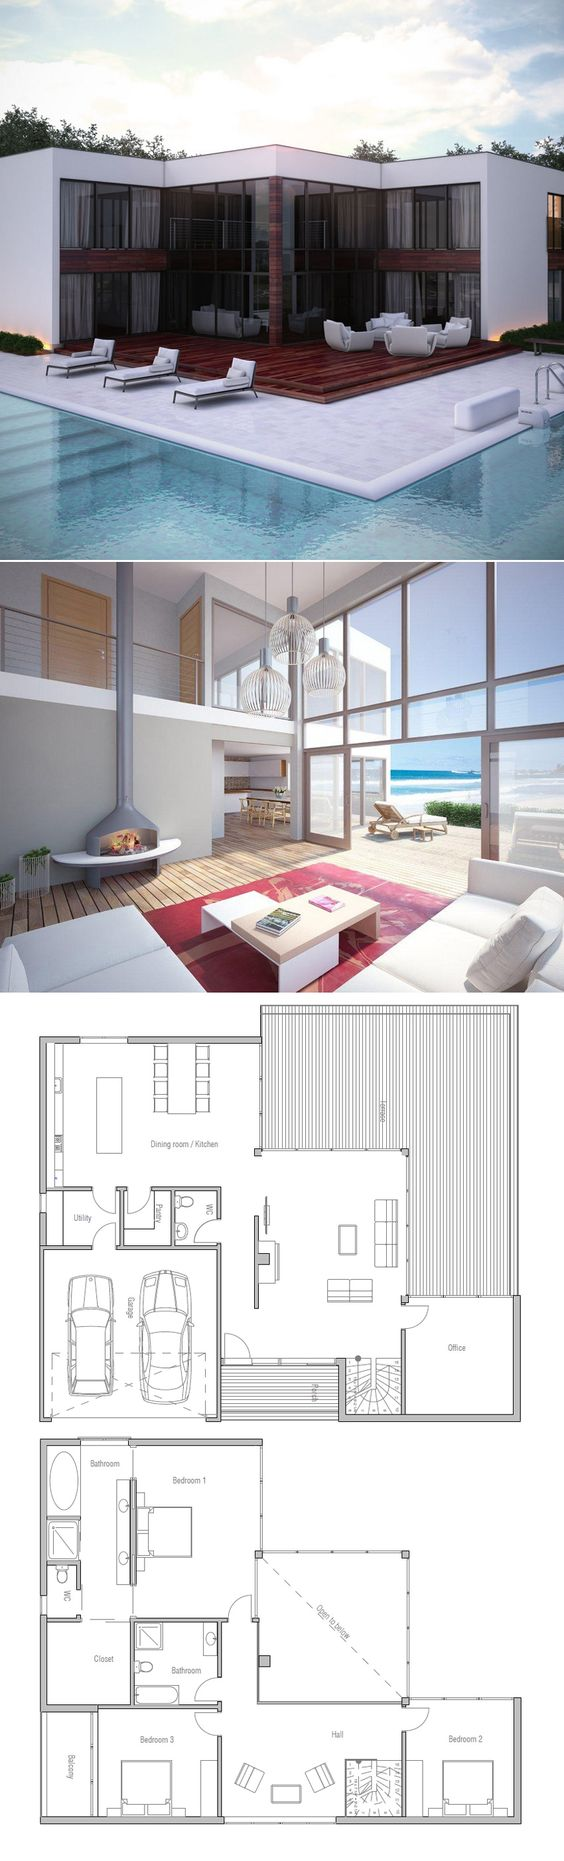 Floor area: 273 m² Building area: 172 m² Bedrooms: 3 Bathrooms: 3 Floors: 2 Height: 5.9 m Width: 17.1 m Depth: 13.8 m Cost to Build: from $ 270 000